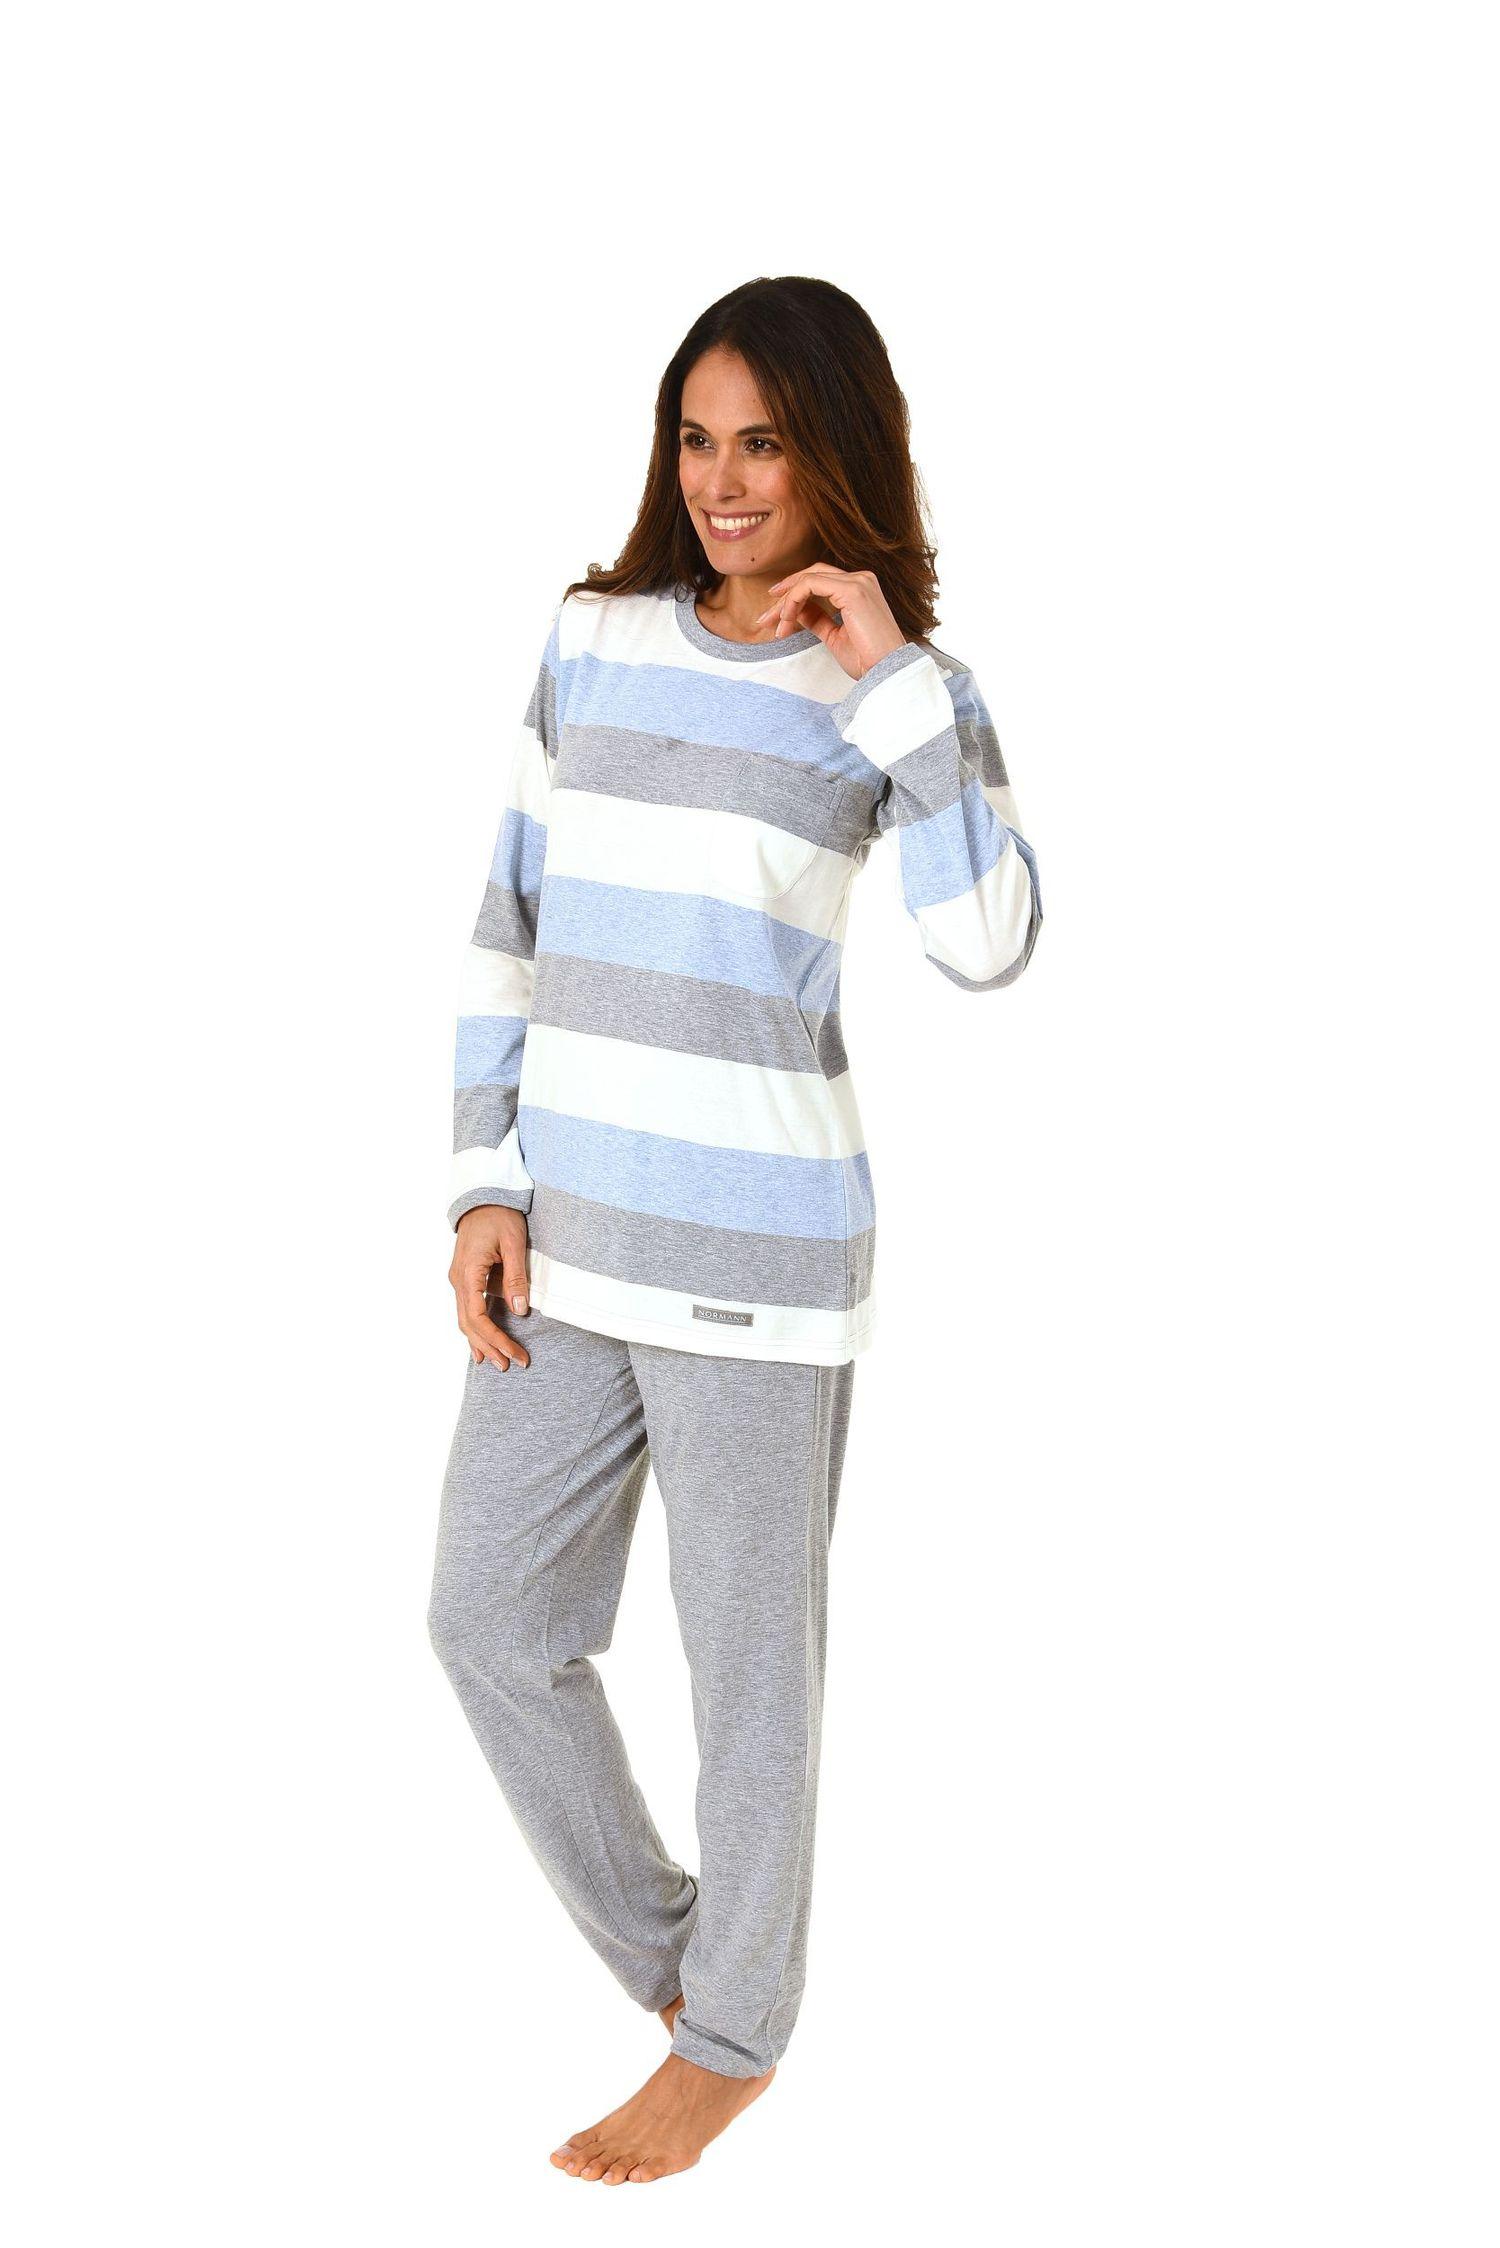 Toller Damen Pyjama  langarm in wunderschöner Block Streifen Optik – 271 201 90 101